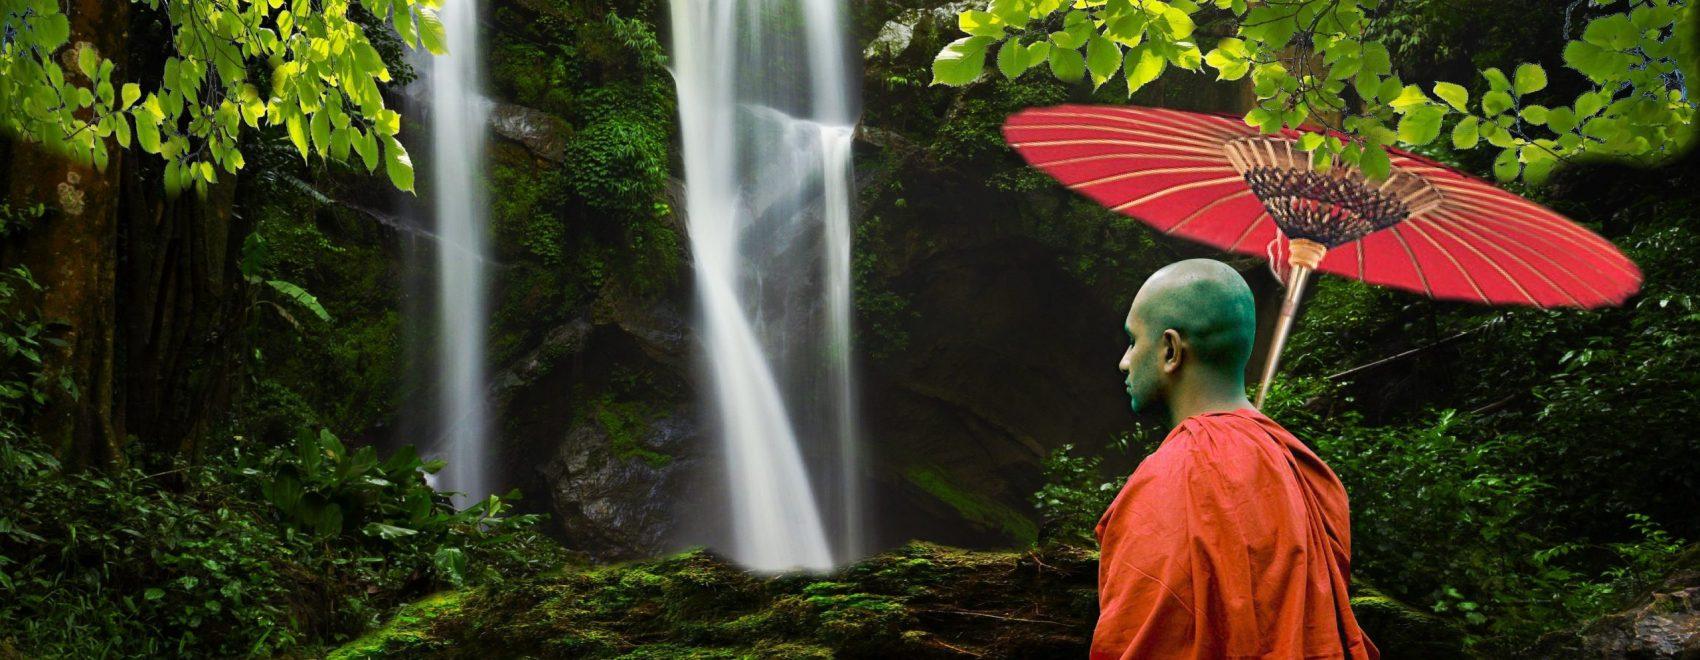 Mindfulness is form of meditation